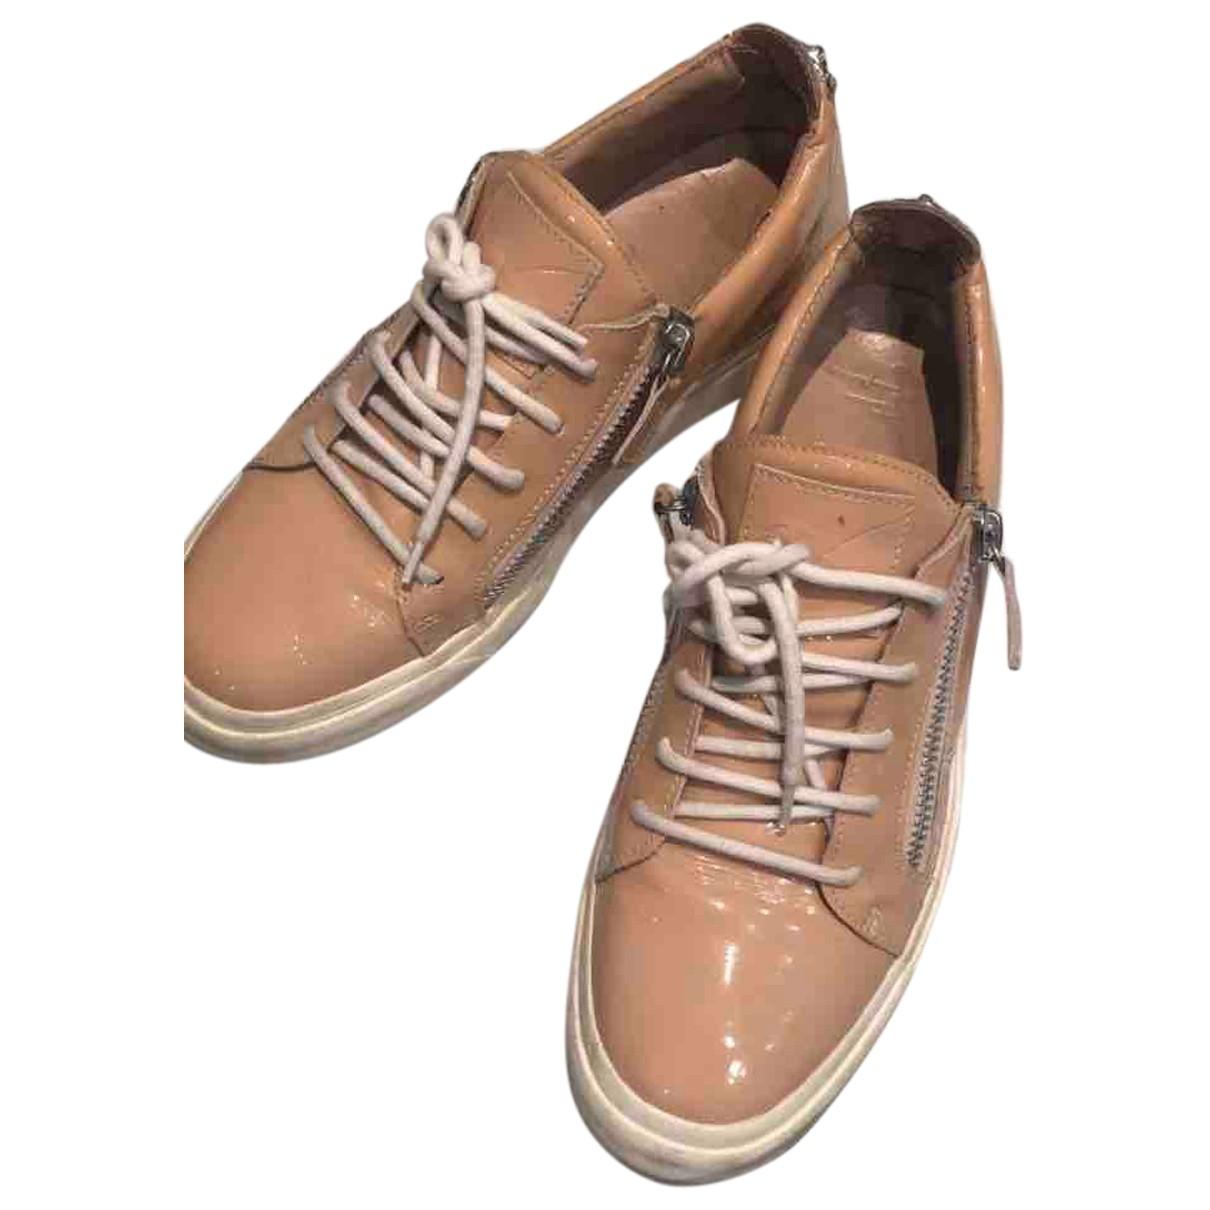 Giuseppe Zanotti Nicki Pink Patent leather Trainers for Women 40 EU